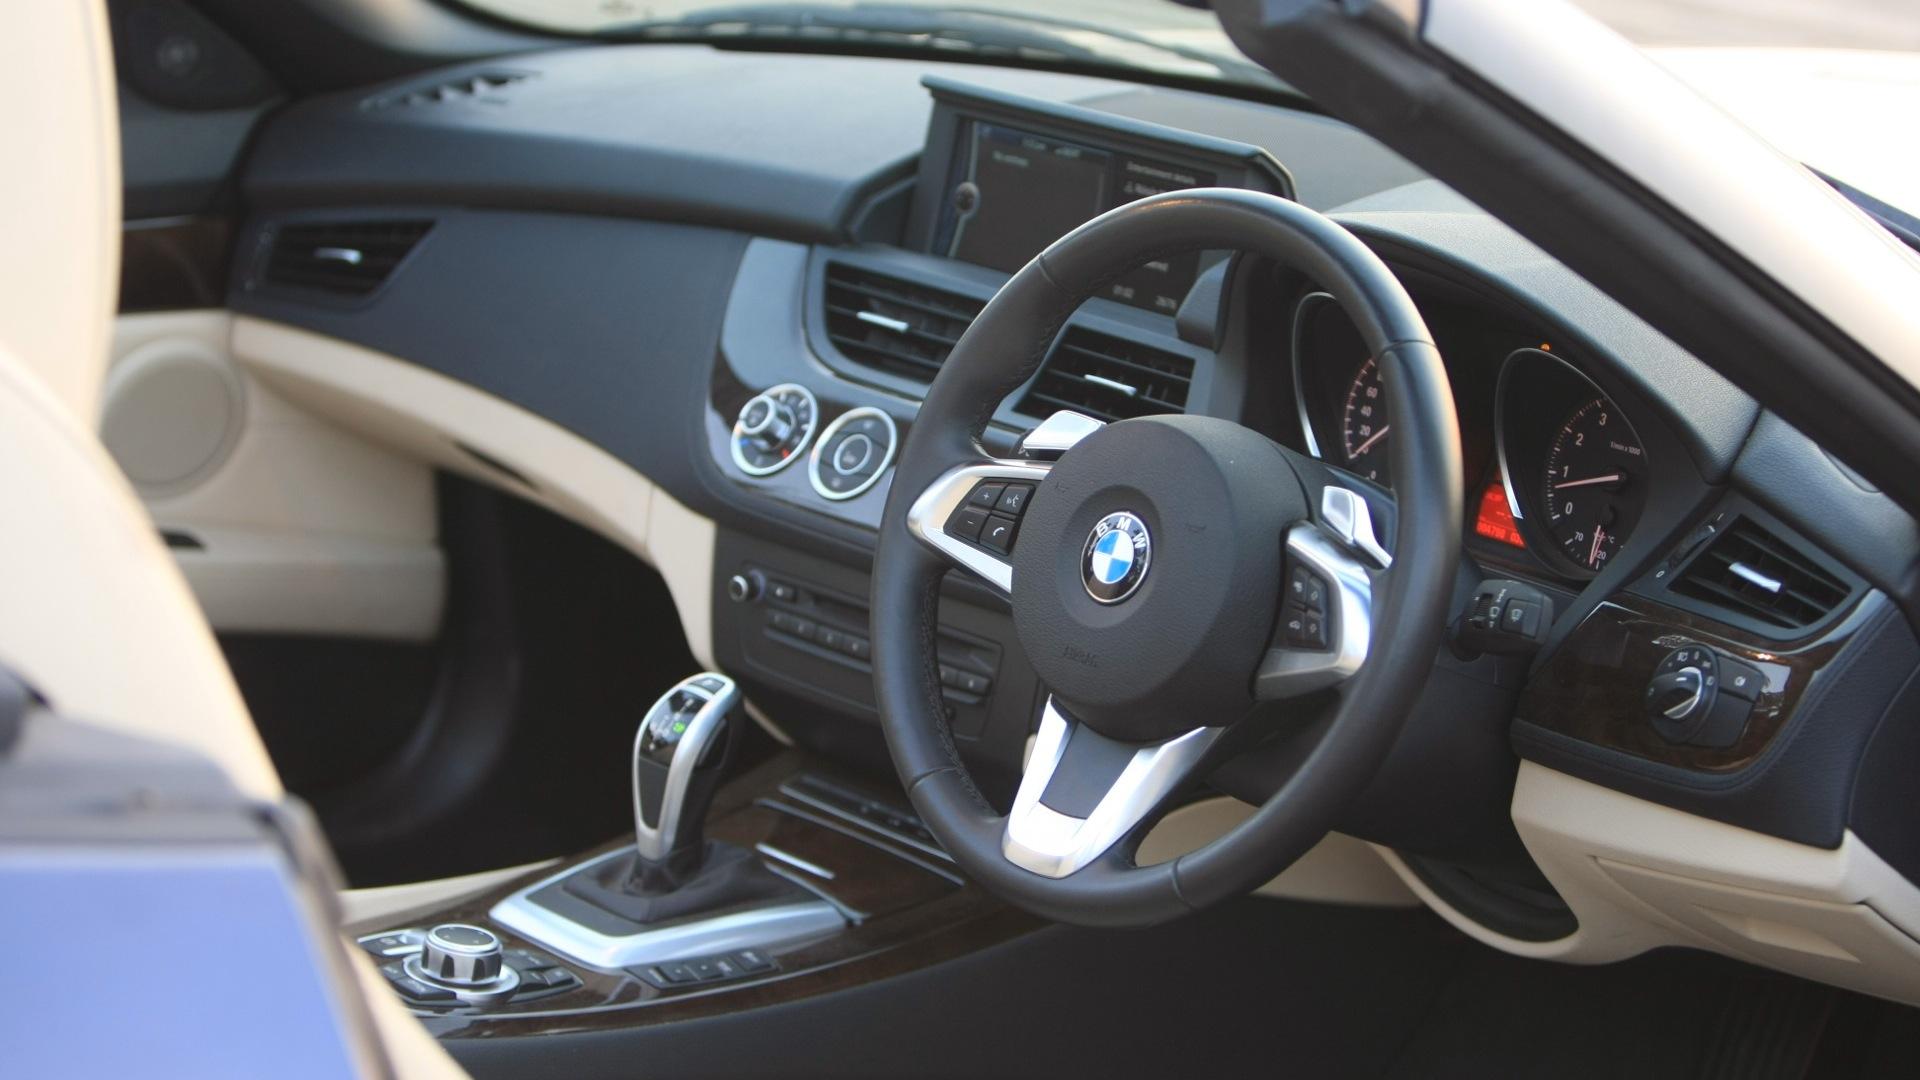 BMW-Z4-2013-sDrive-3-5i-Interior